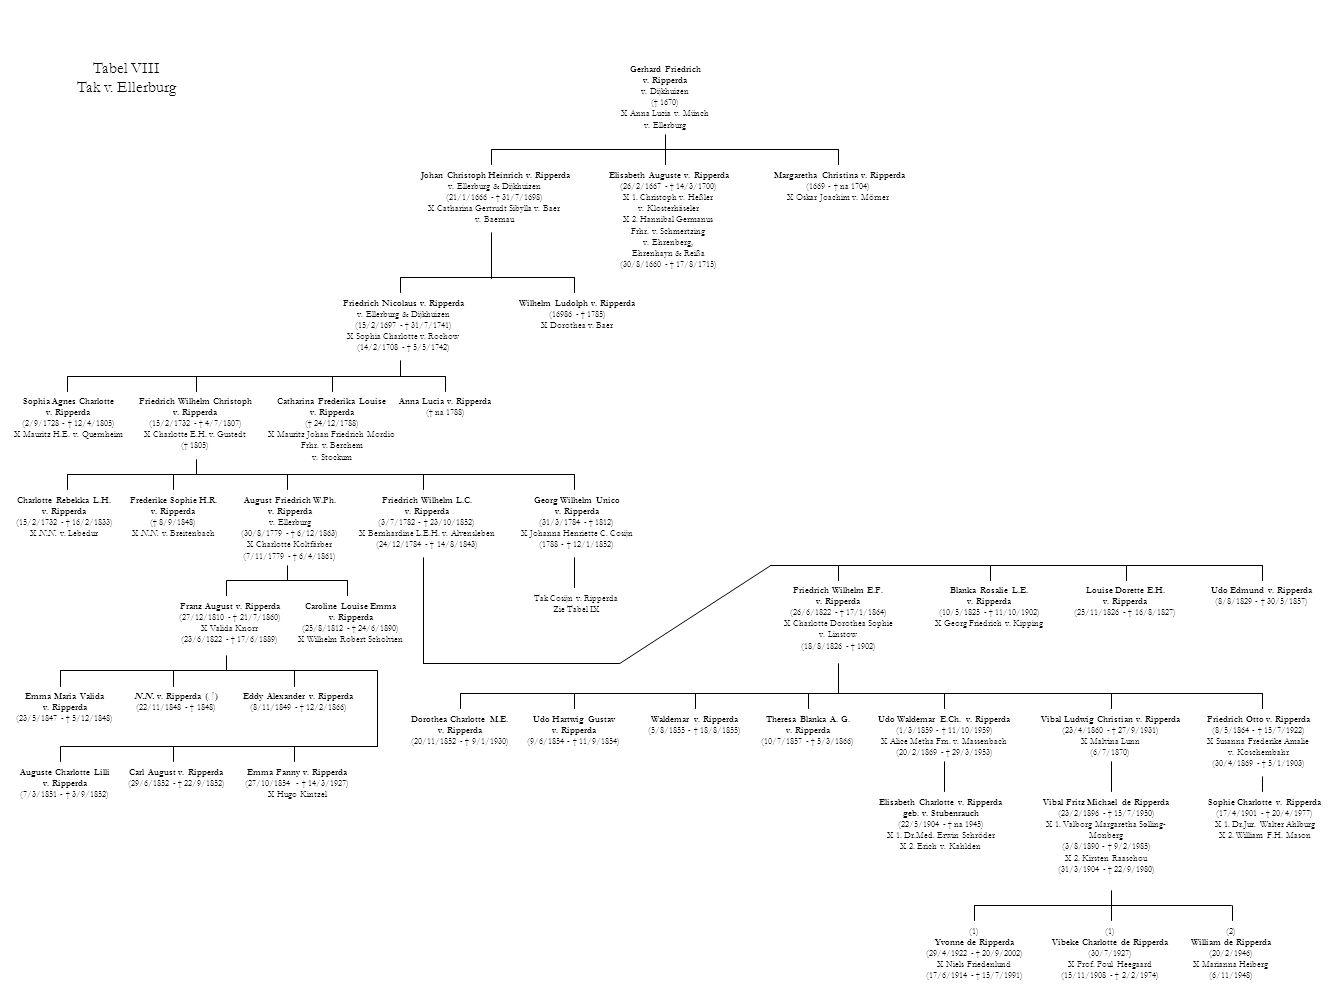 Tabel VIII Tak v. Ellerburg Gerhard Friedrich v. Ripperda v. Dijkhuizen († 1670) X Anna Lucia v. Münch v. Ellerburg Margaretha Christina v. Ripperda (